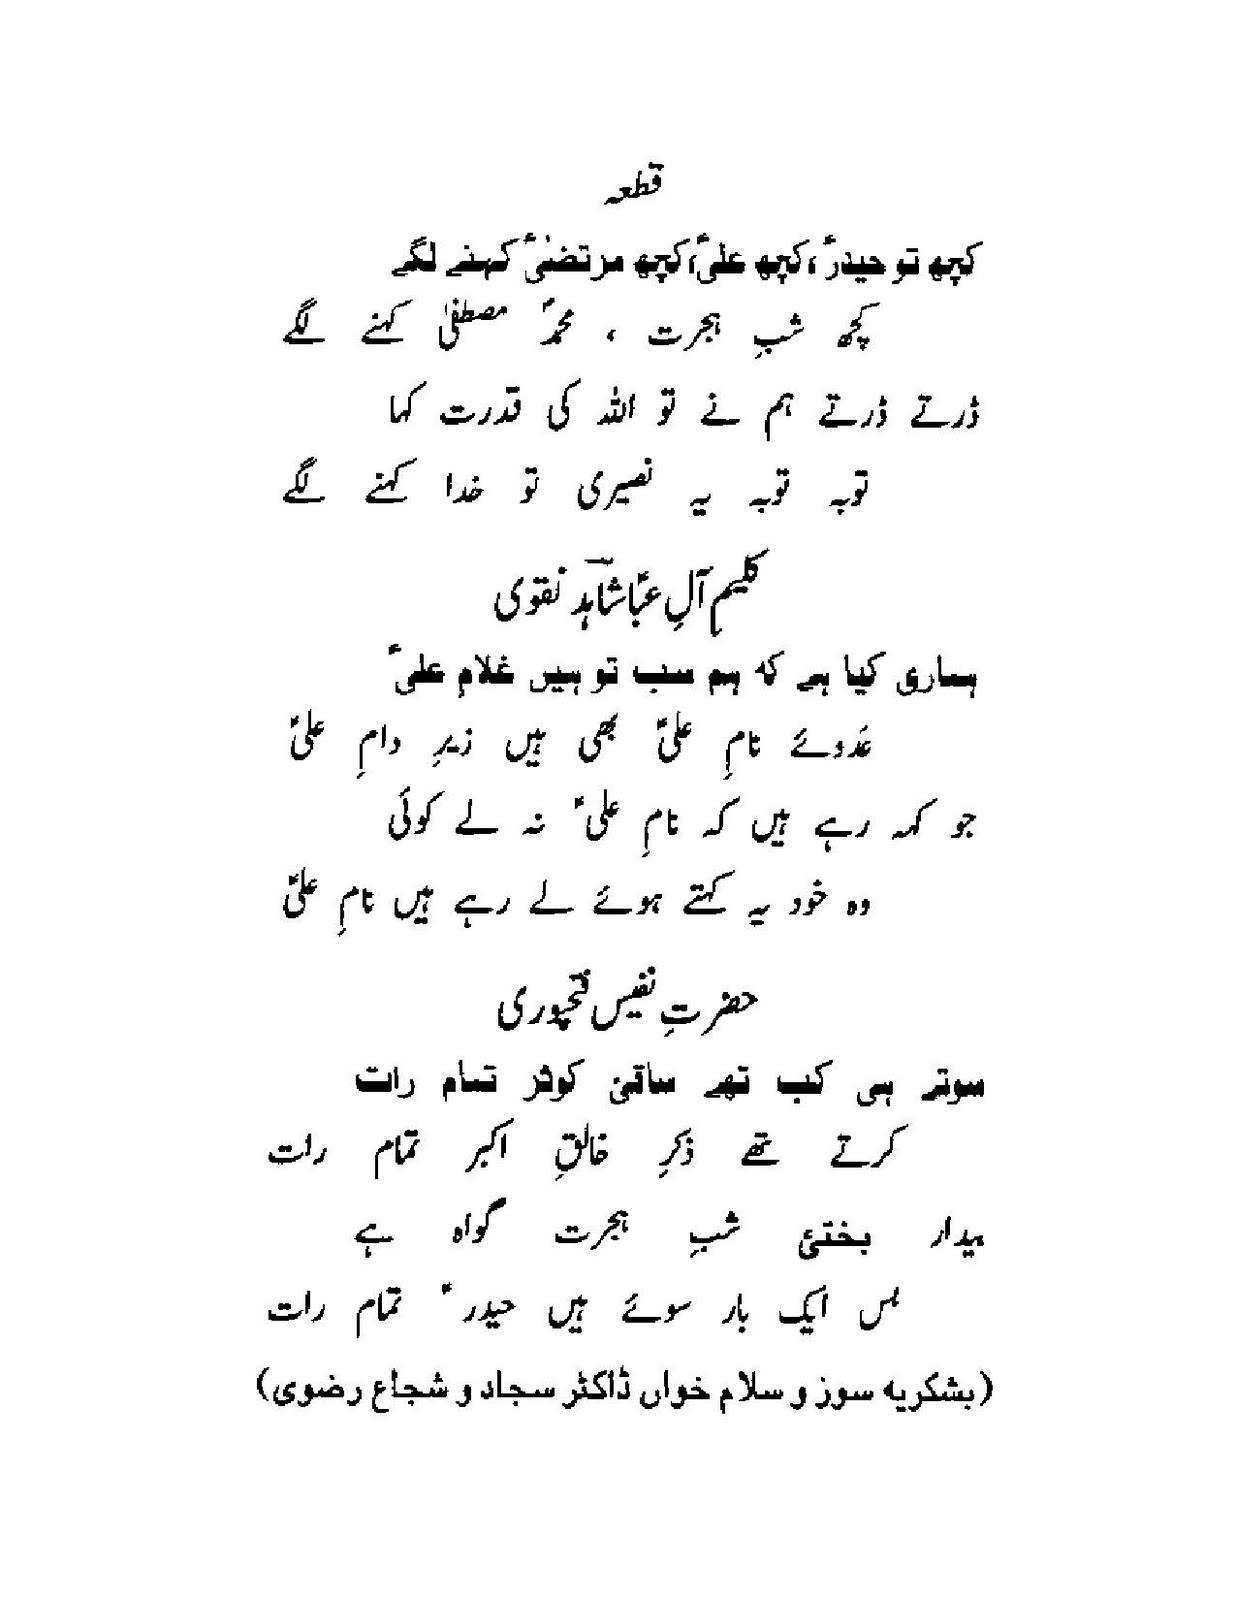 Dast Basta By Bano Qudsia Pdf Free Download - The Library Pk